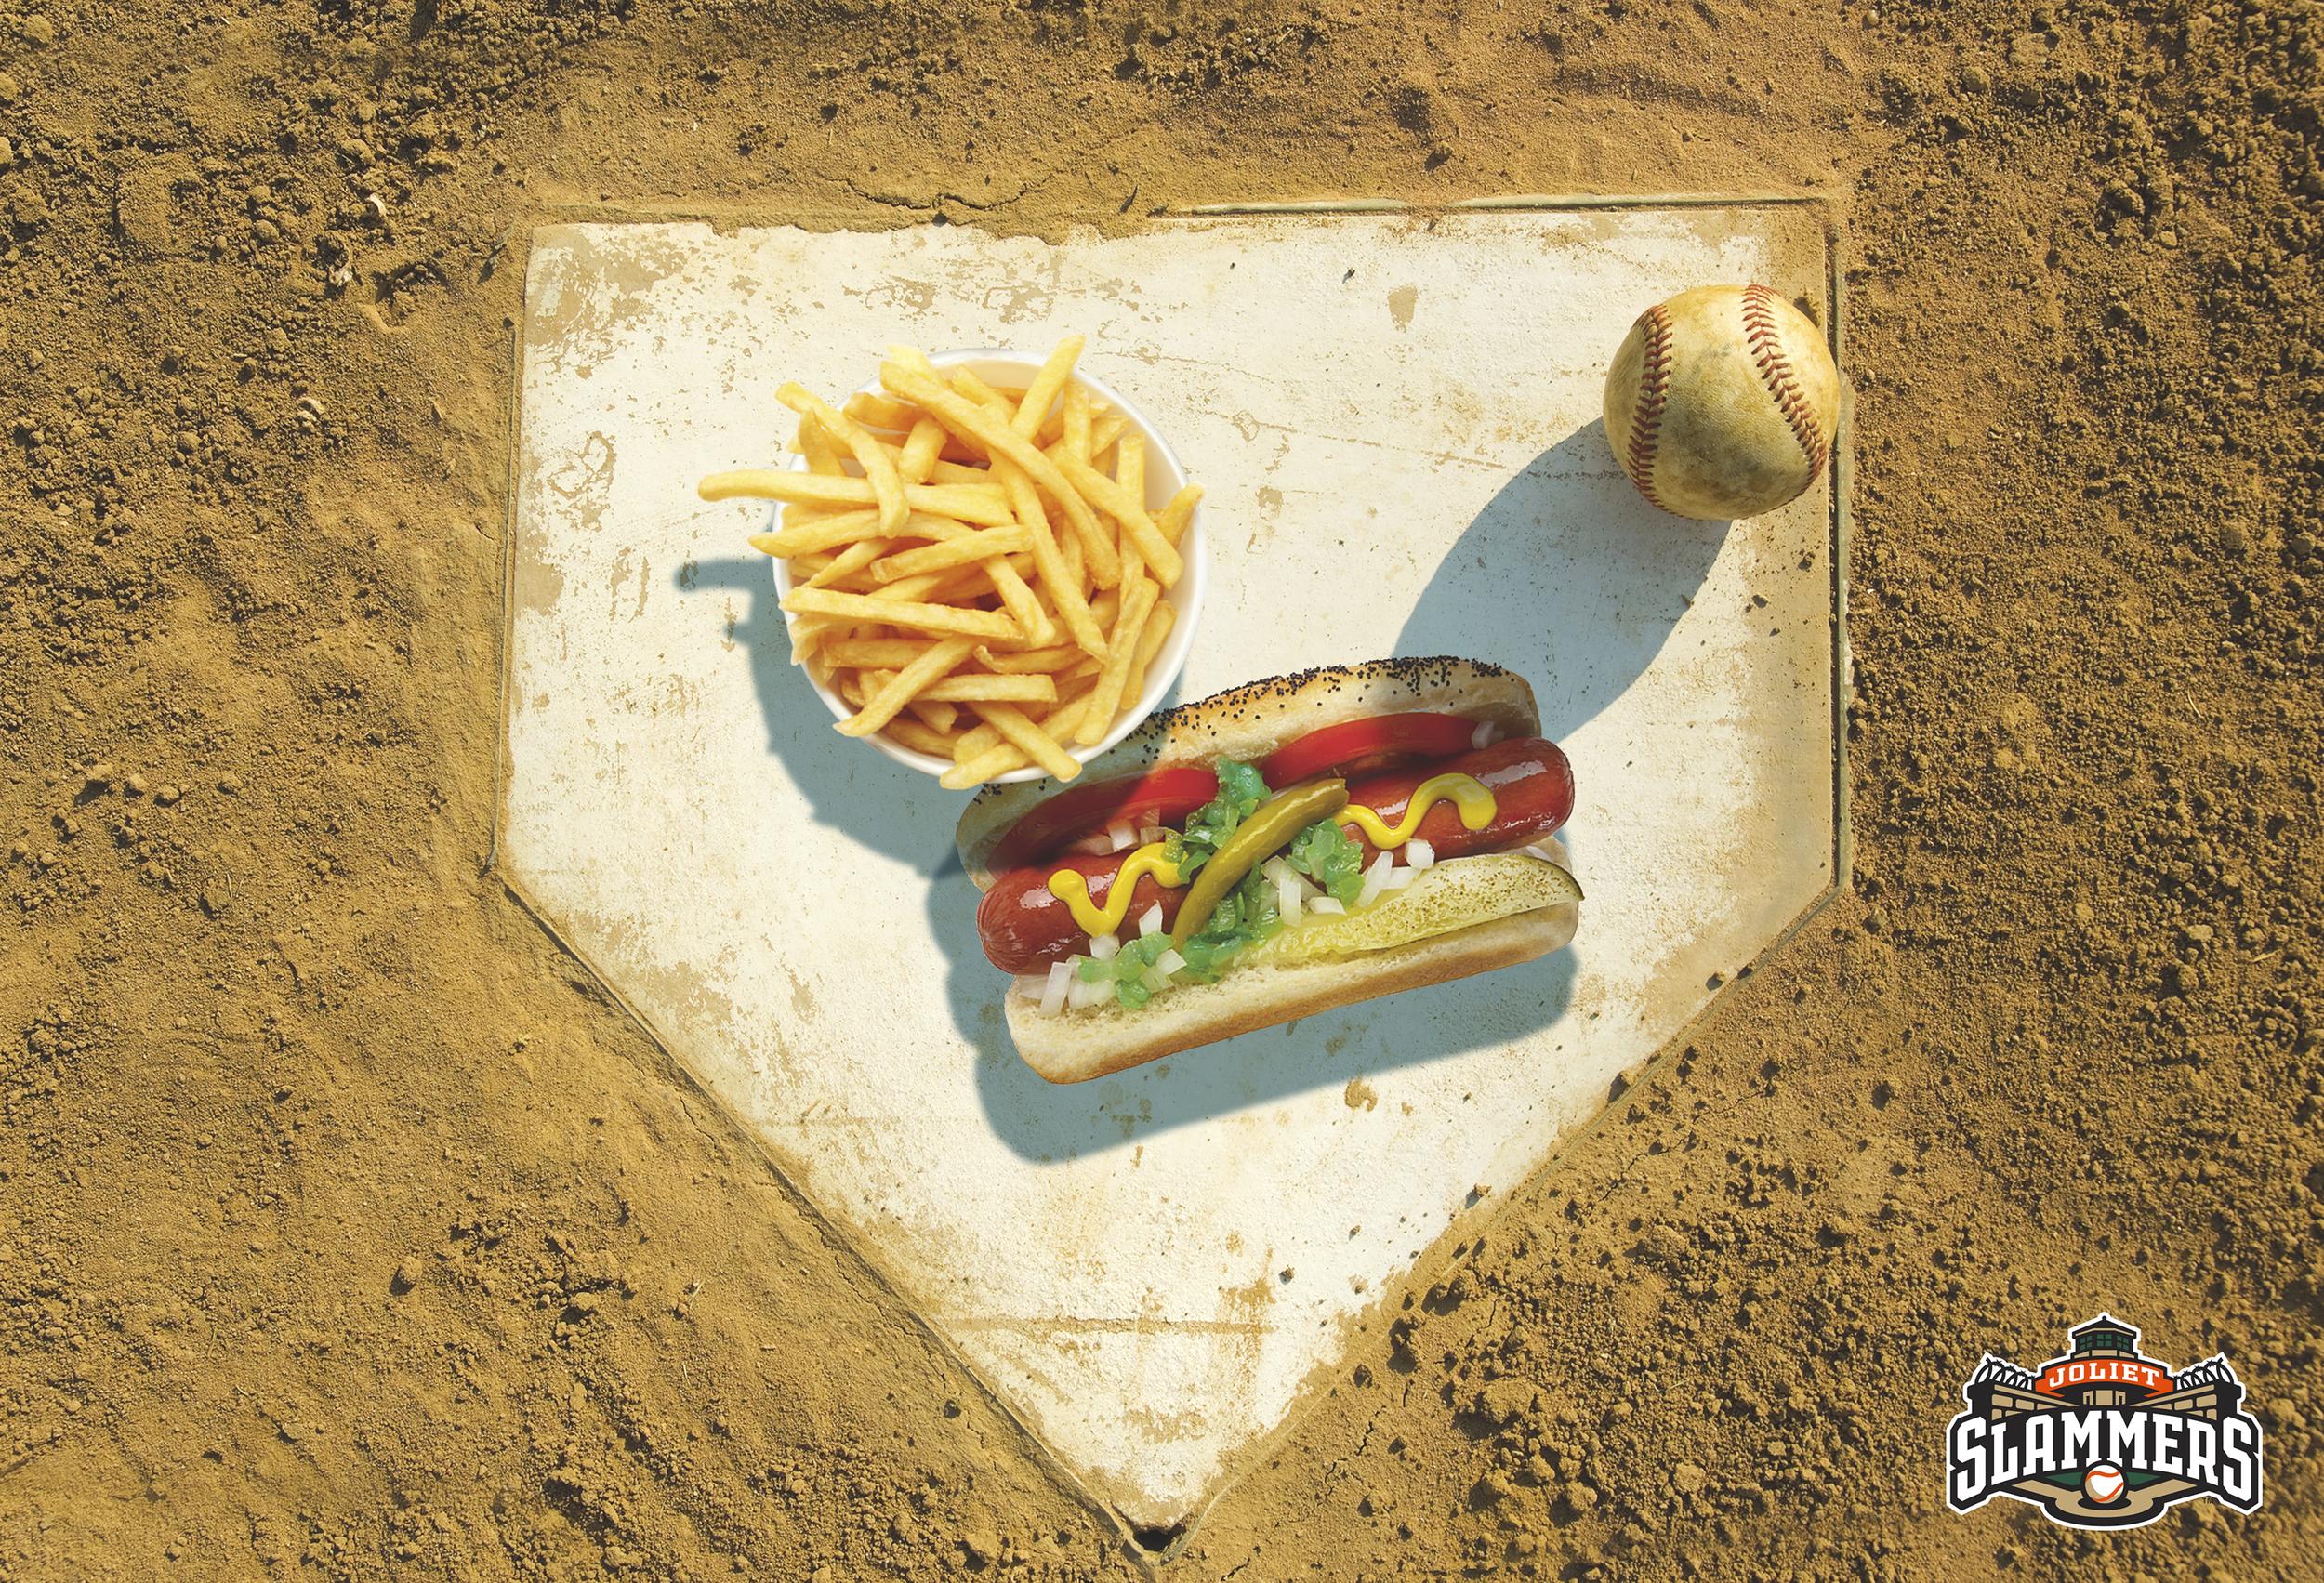 Home Plate concession area conceptual poster design.